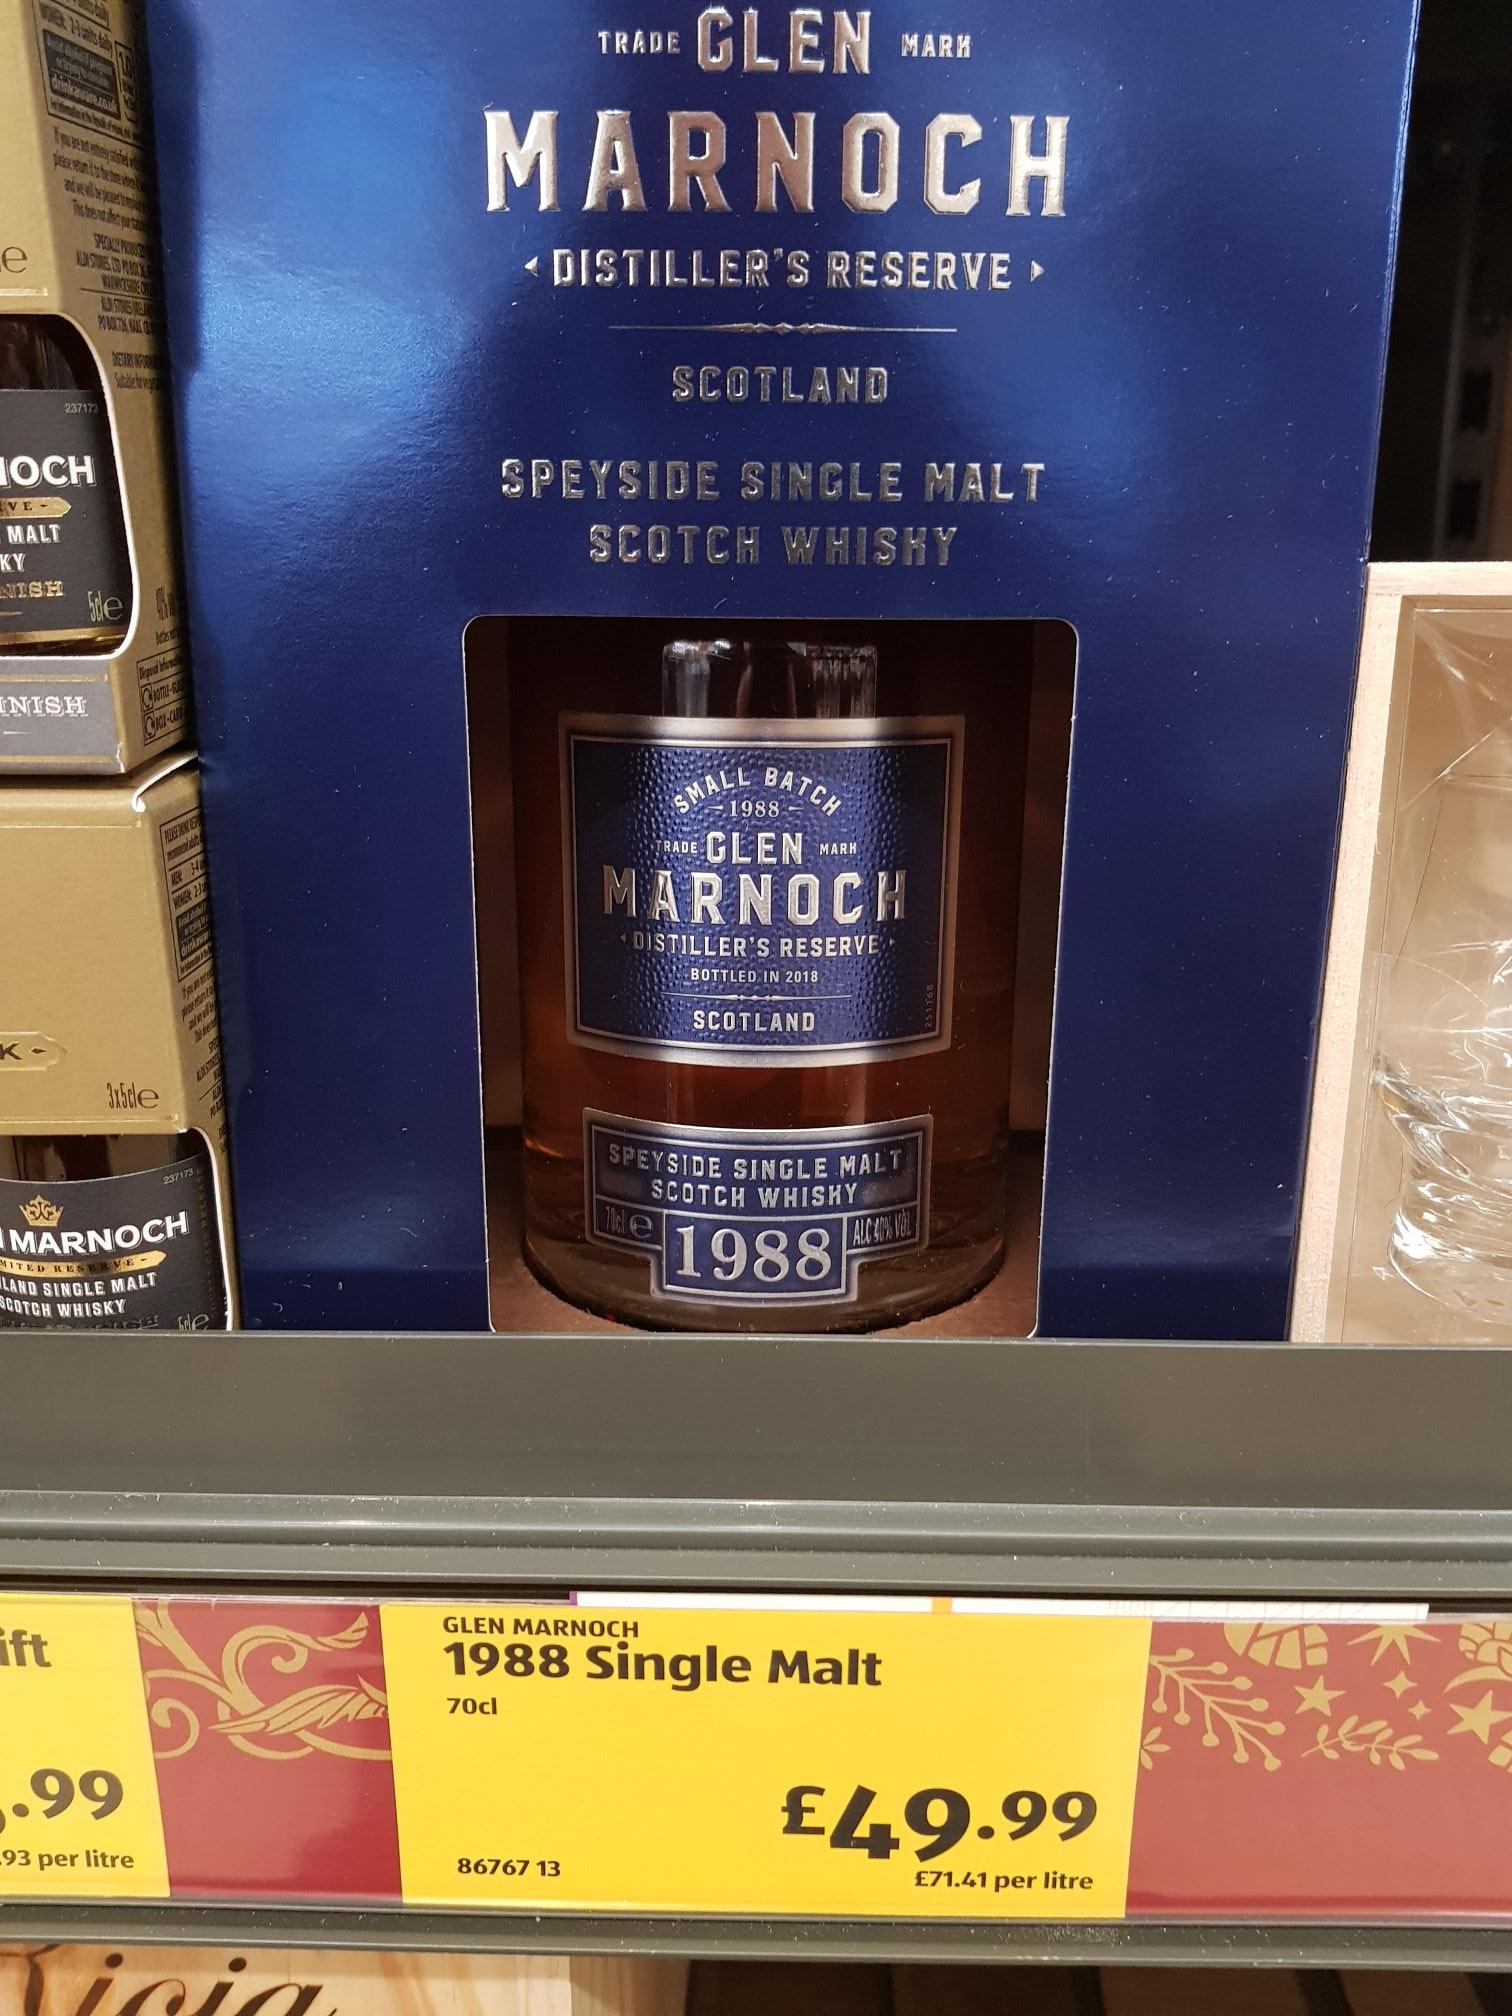 Aldi glen marnoch 1988 speyside single malt whisky £49.99